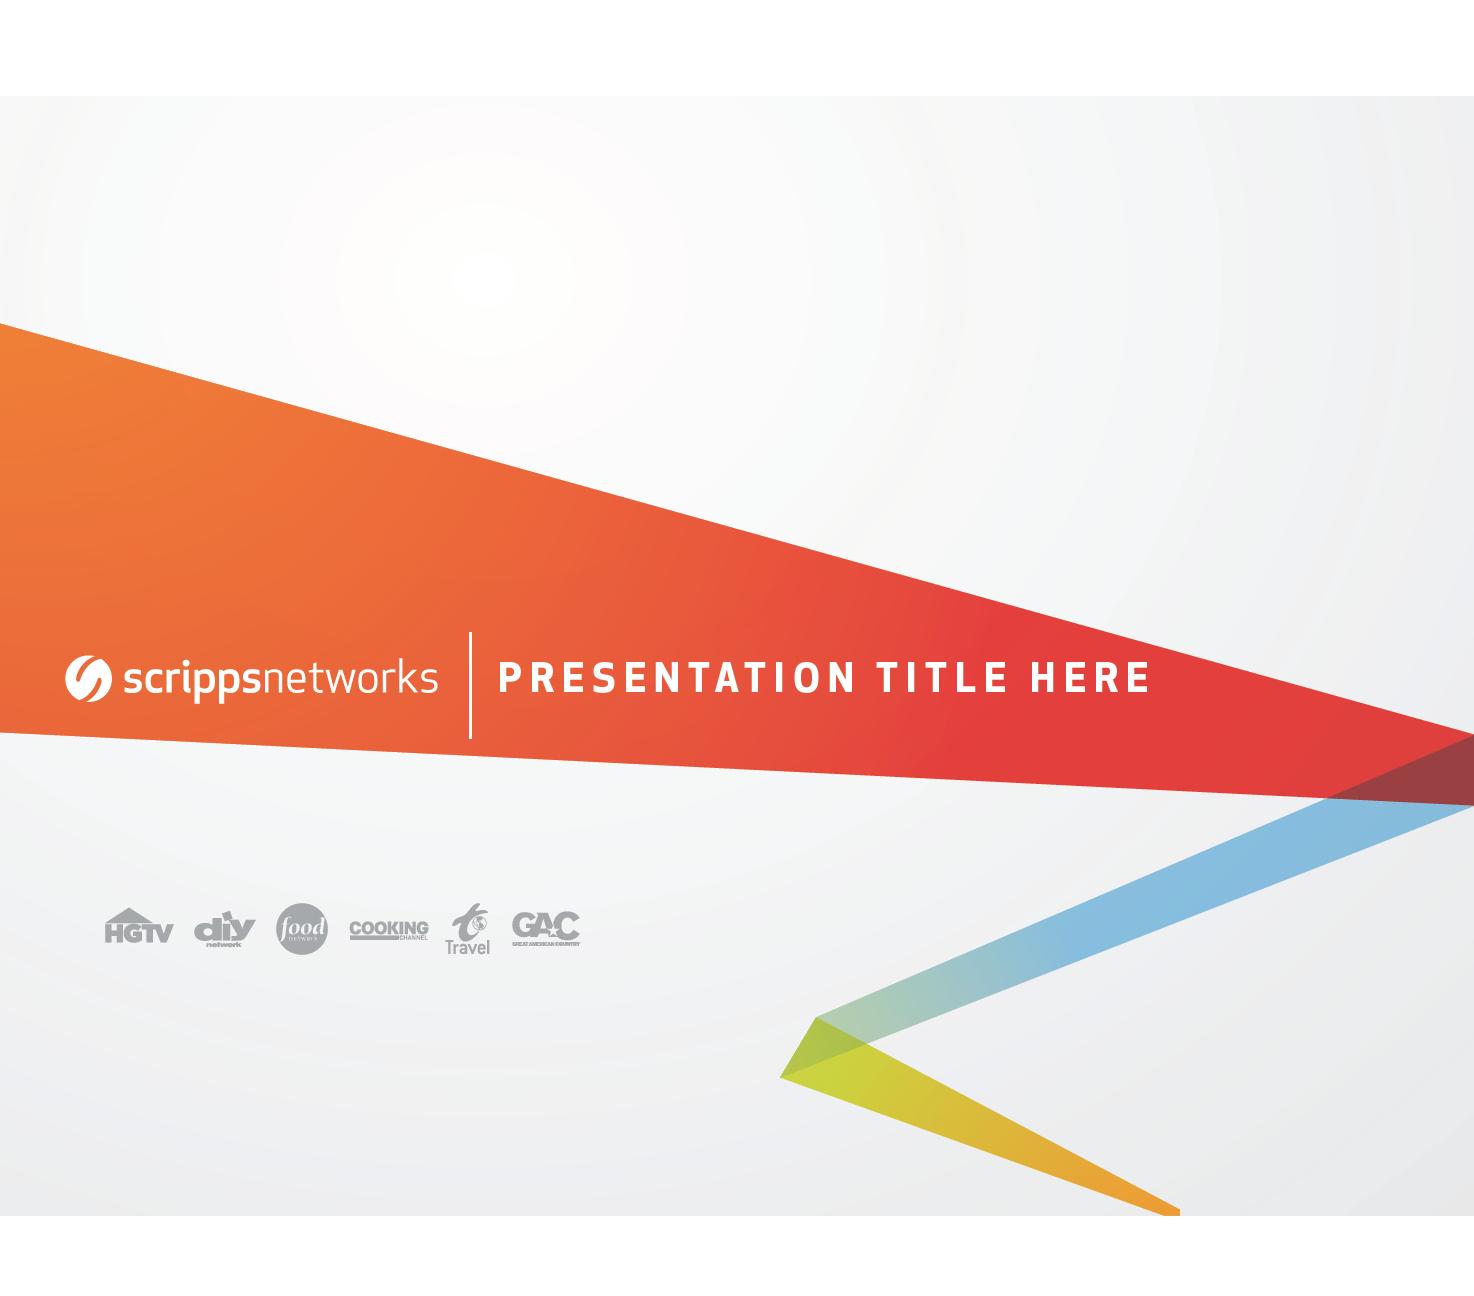 ScrippsNetworks Brand Template